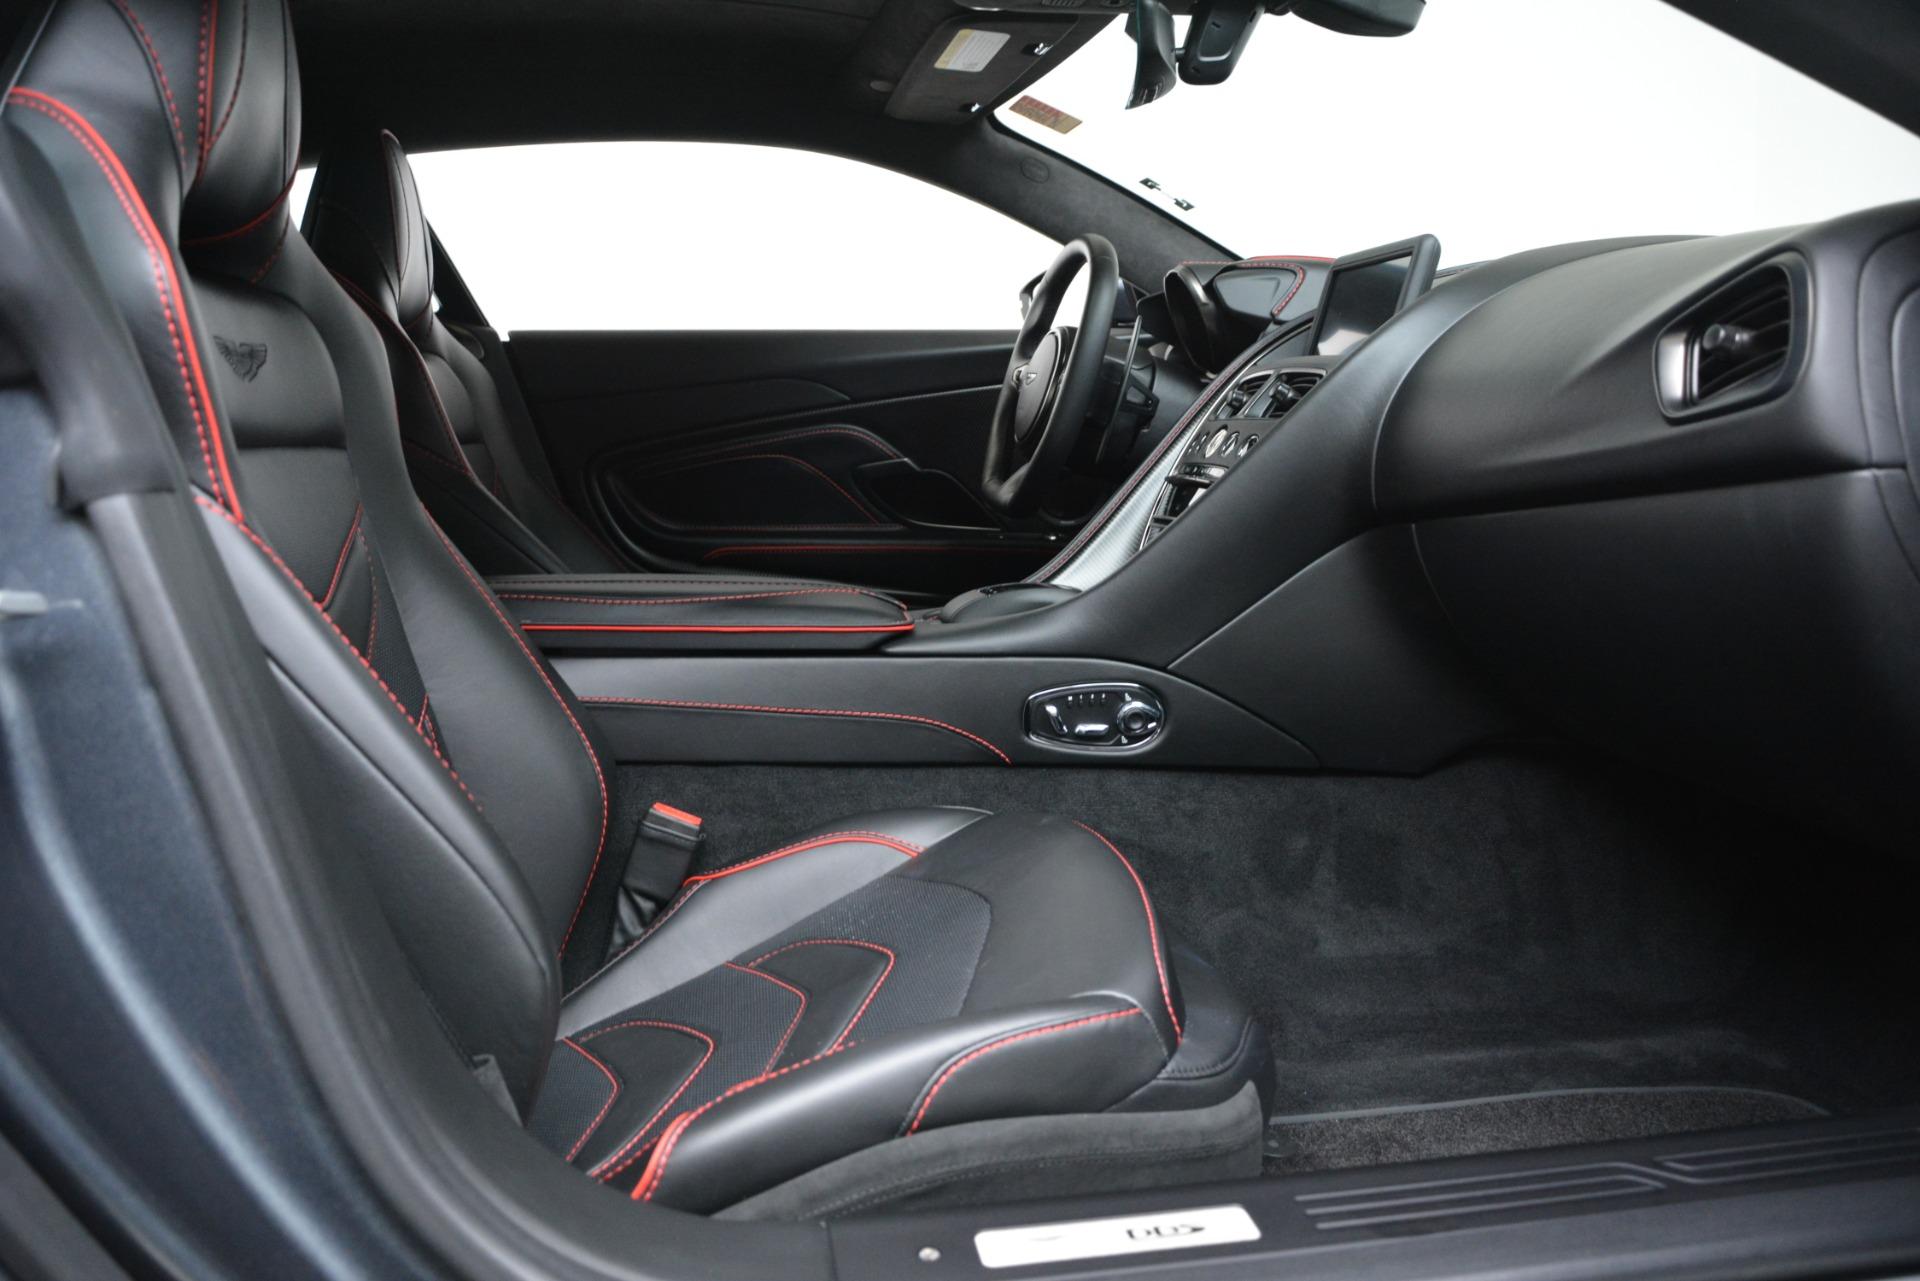 New 2019 Aston Martin DBS Superleggera For Sale In Westport, CT 3318_p15